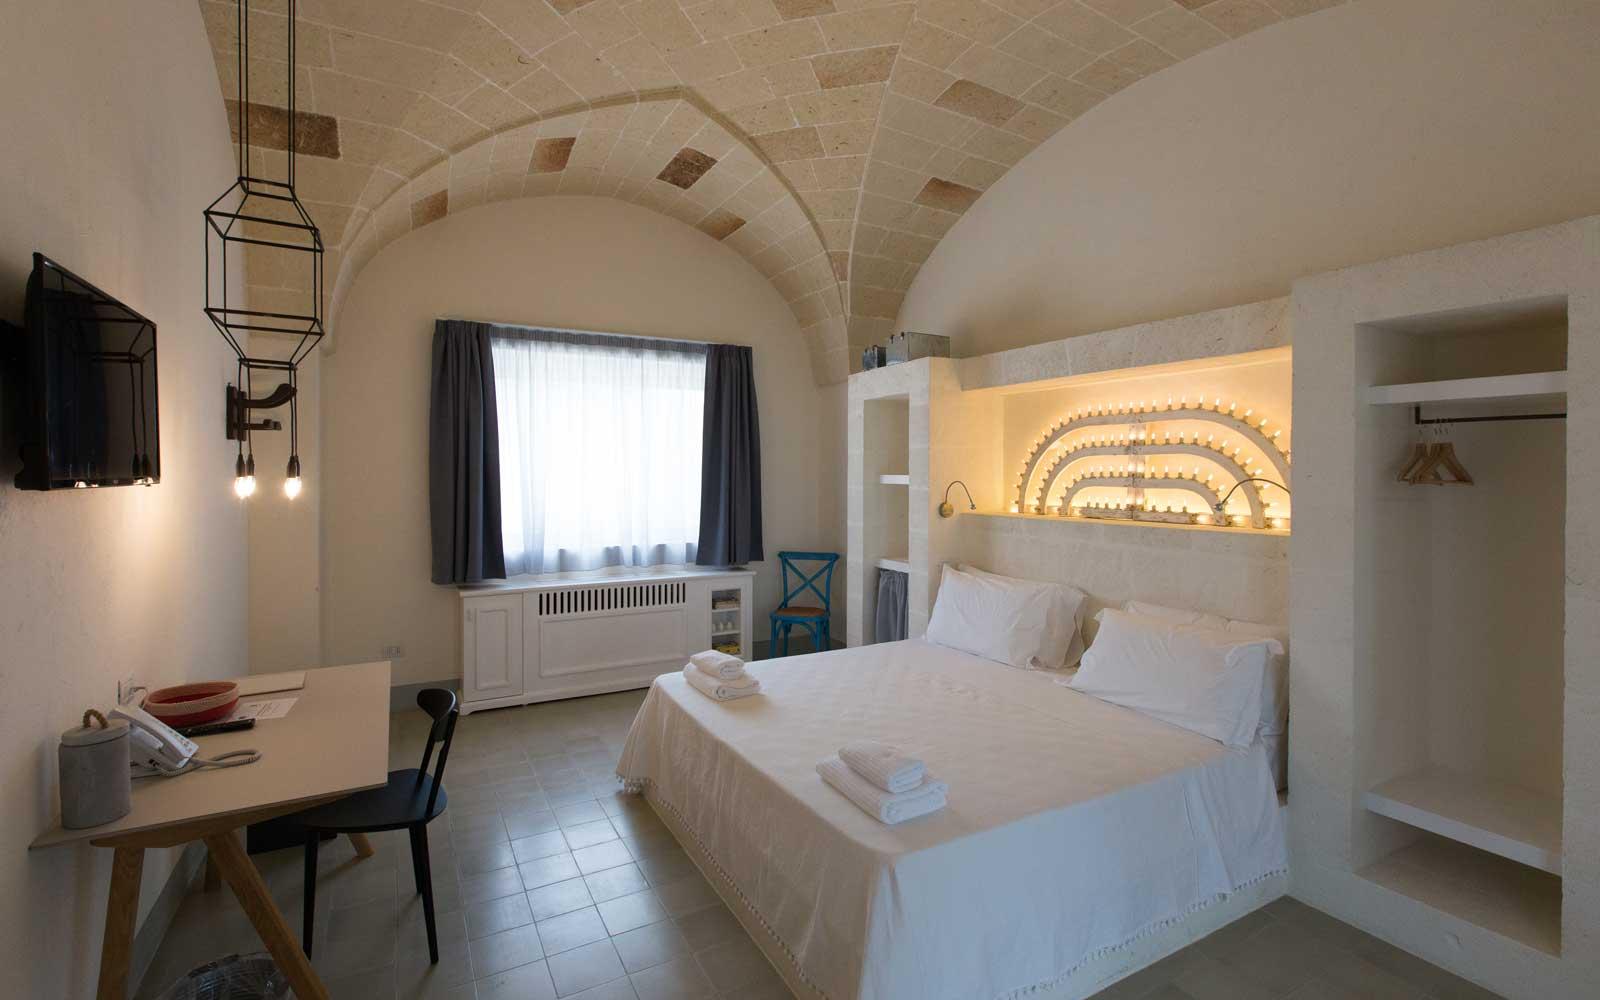 Deluxe Room at Vinilia Wine Resort